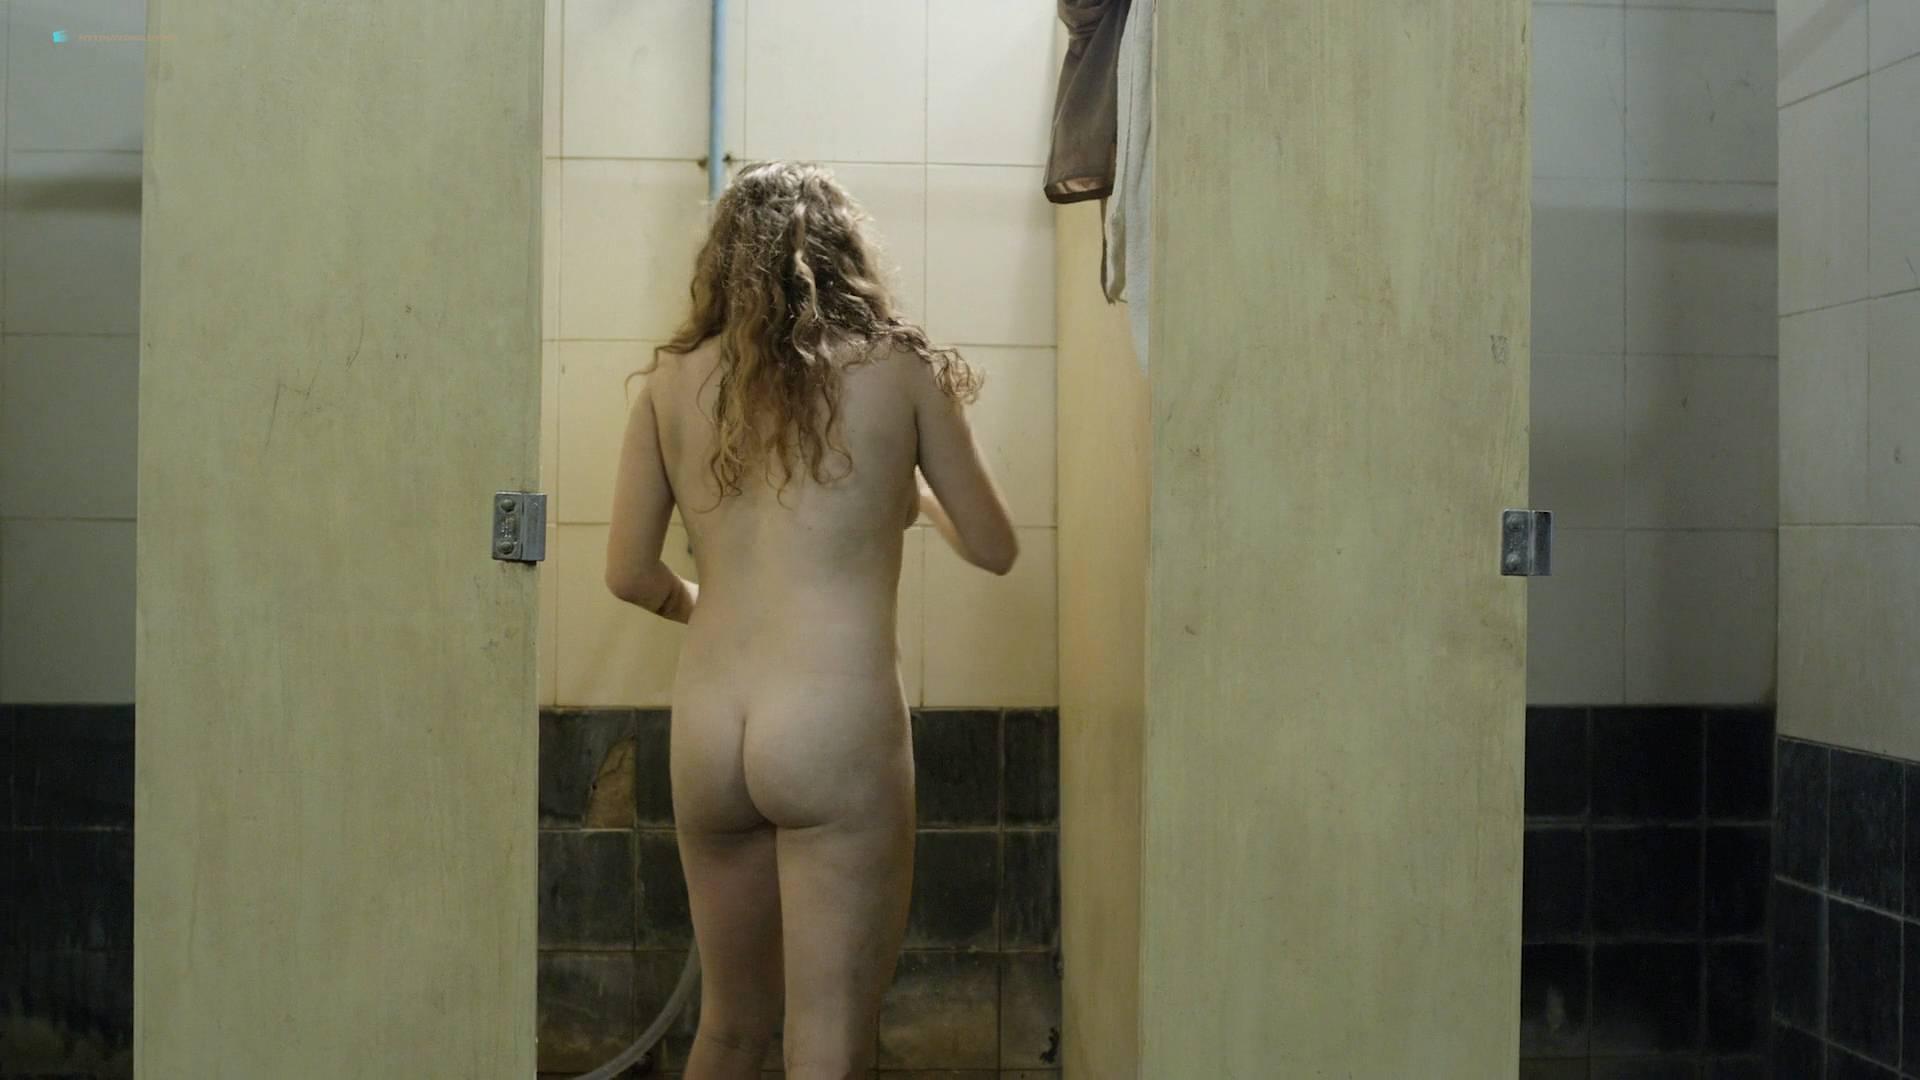 Kelly-McCart-nude-full-frontal-Katrina-Grey-nude-lesbian-sex-Locked-Up-2017-HD-1080p-Web-006.jpg